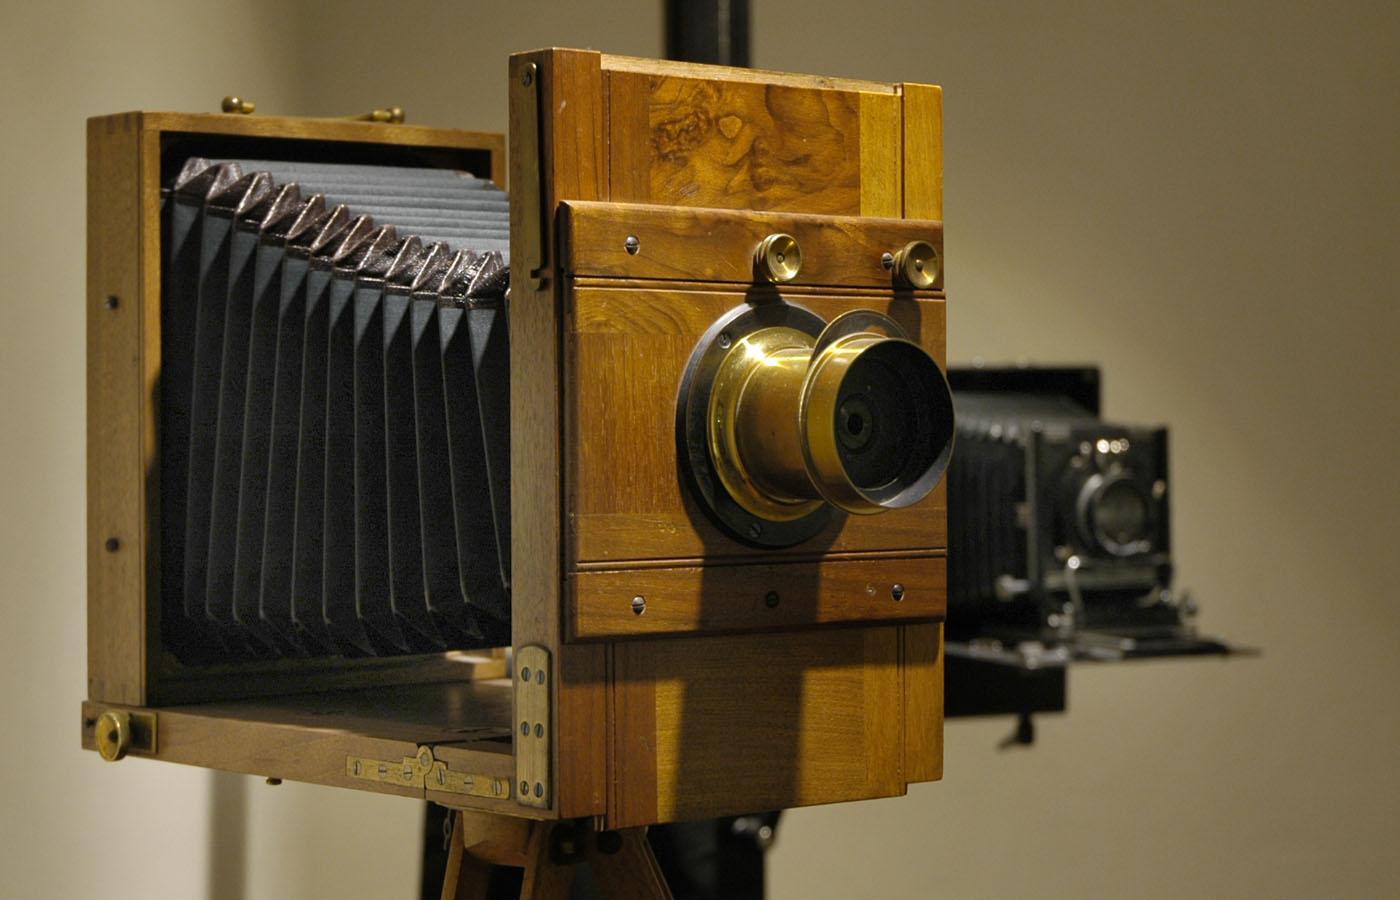 Kamera im Haus aus Queck